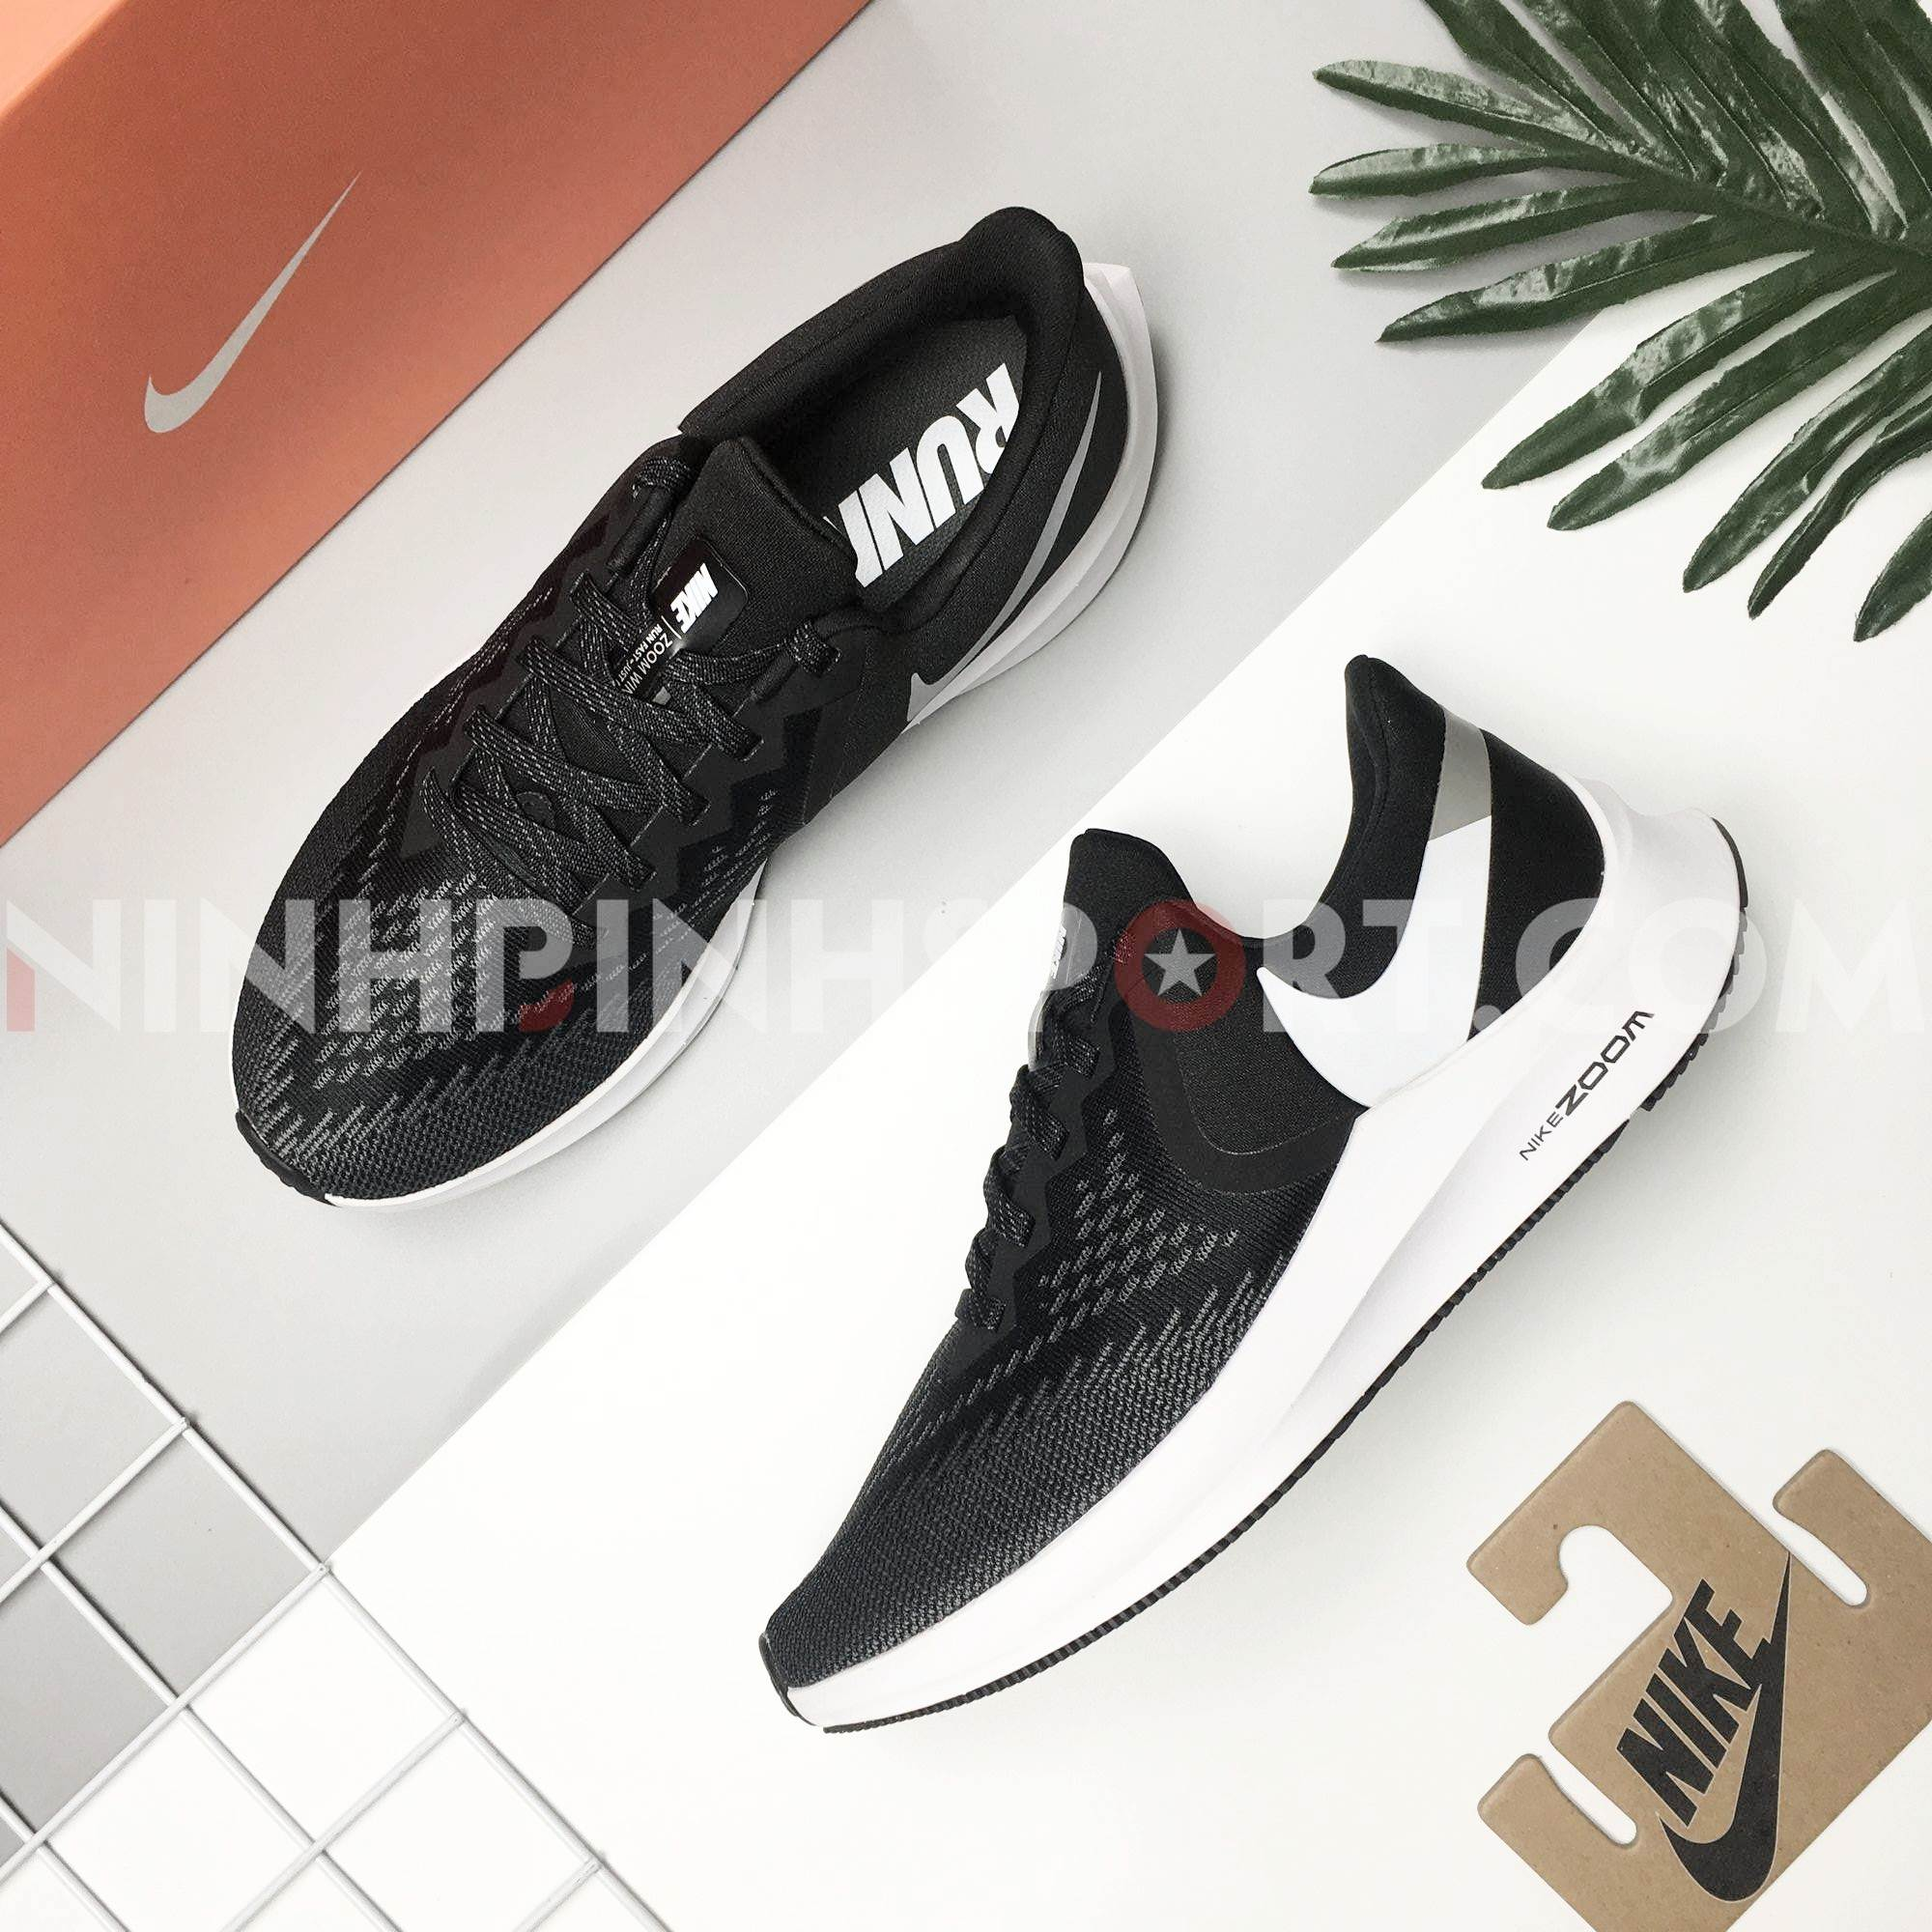 Giày thể thao nam Nike Zoom Winflo 6 Black AQ7497-001